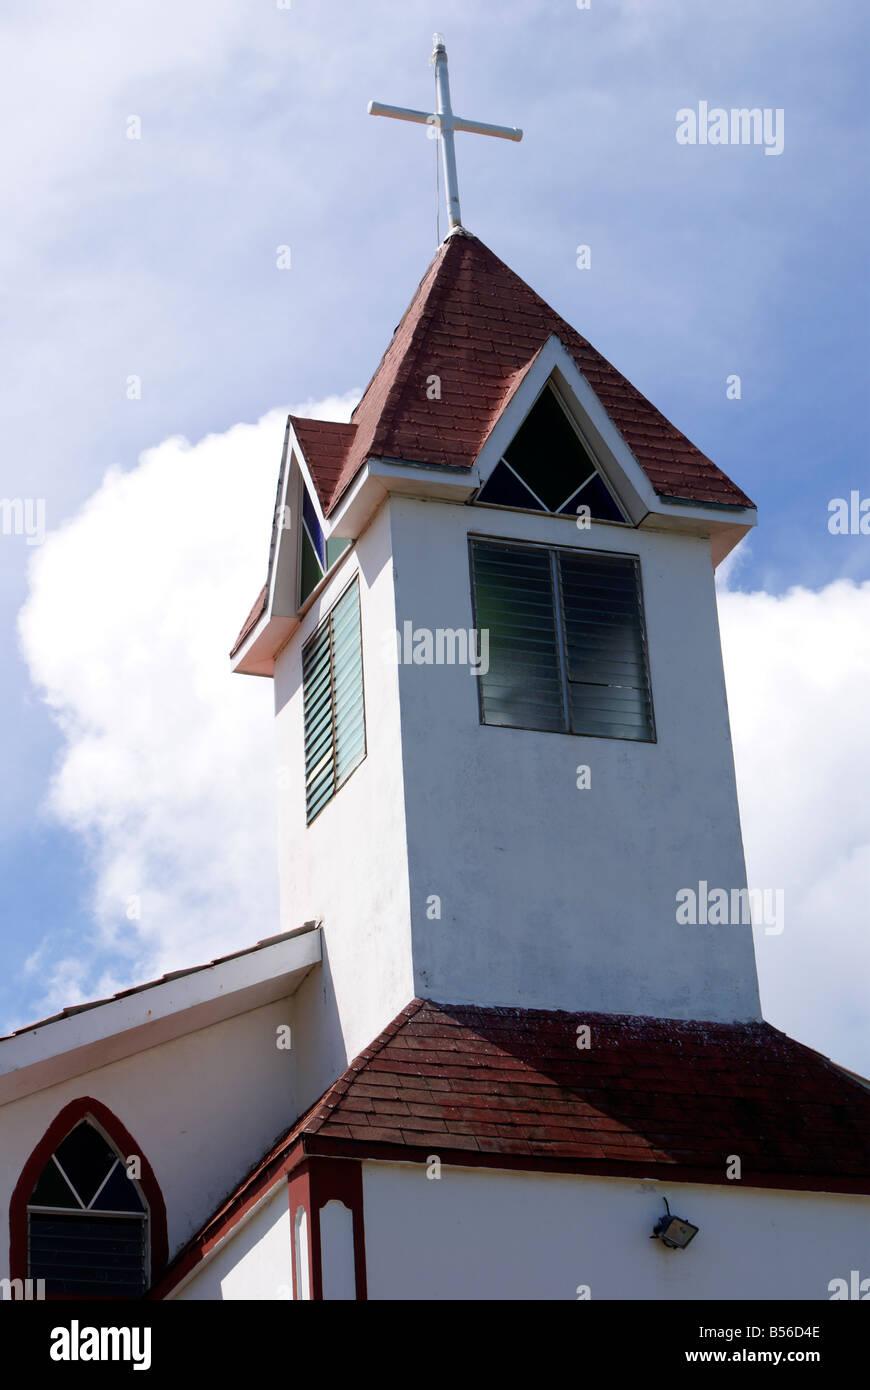 Ebeneezer Baptist Church auf Big Corn Island, Nicaragua, Mittelamerika Stockfoto